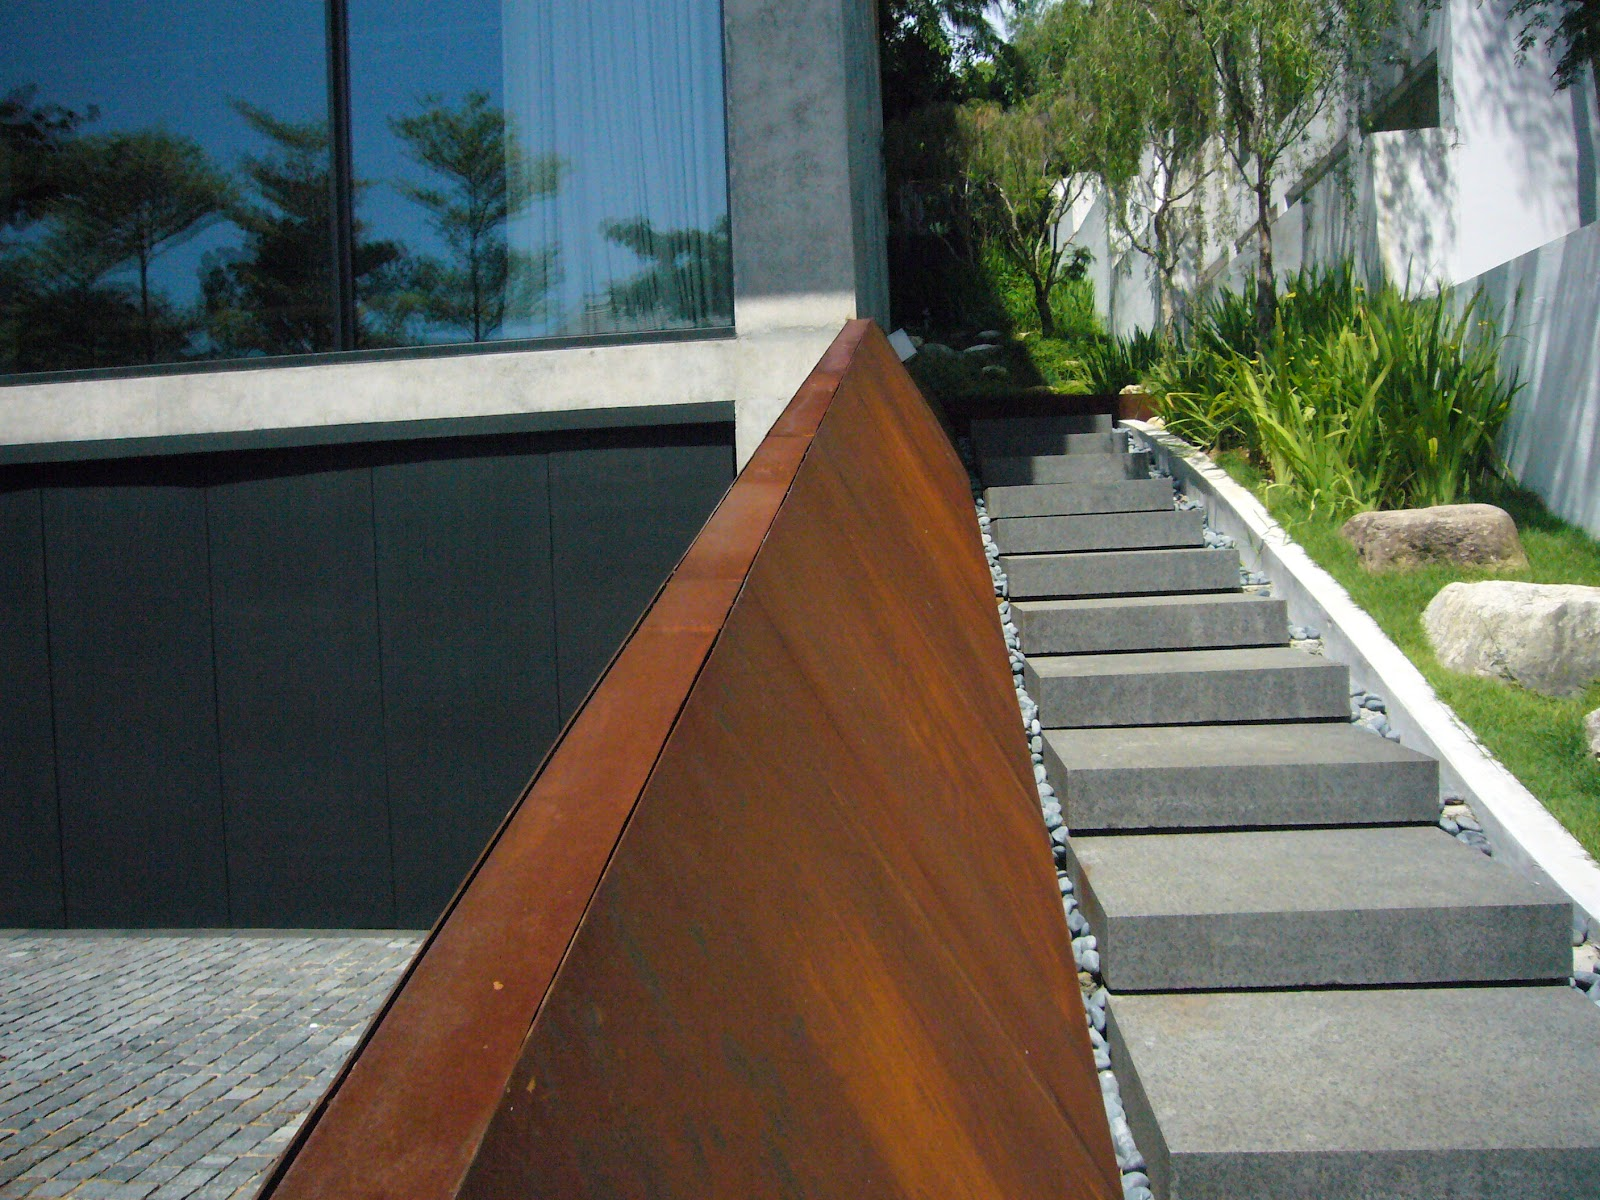 corten steel designs and engineering may 2012. Black Bedroom Furniture Sets. Home Design Ideas